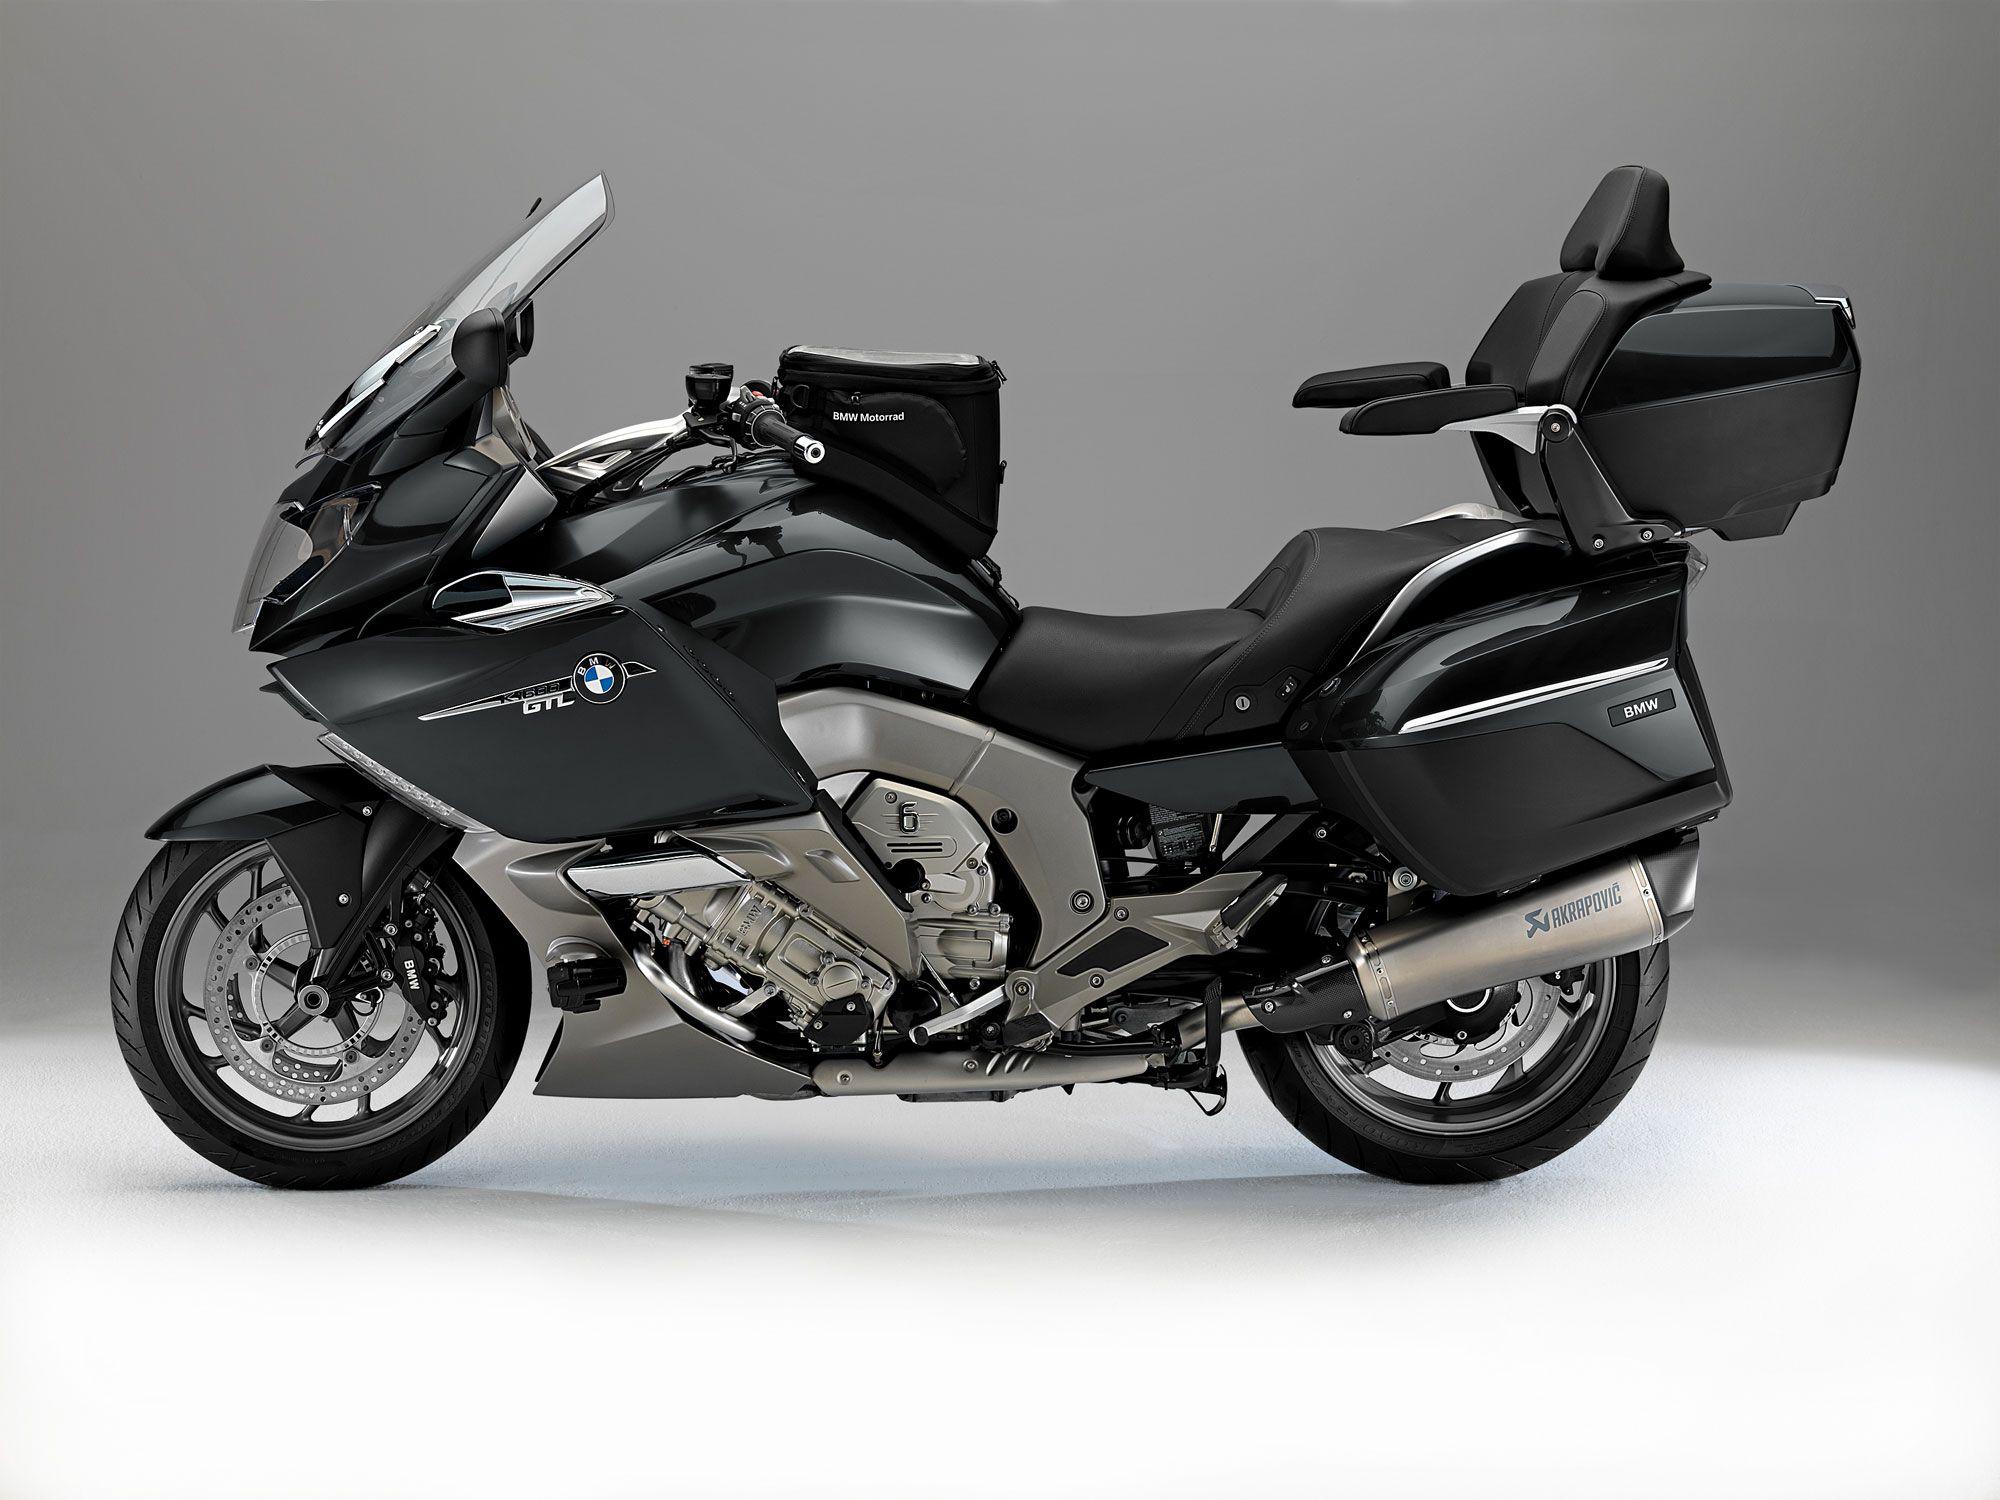 Https www google com blank html bmw motorcyclescustom motorcyclesbmw sporttouringhandmade